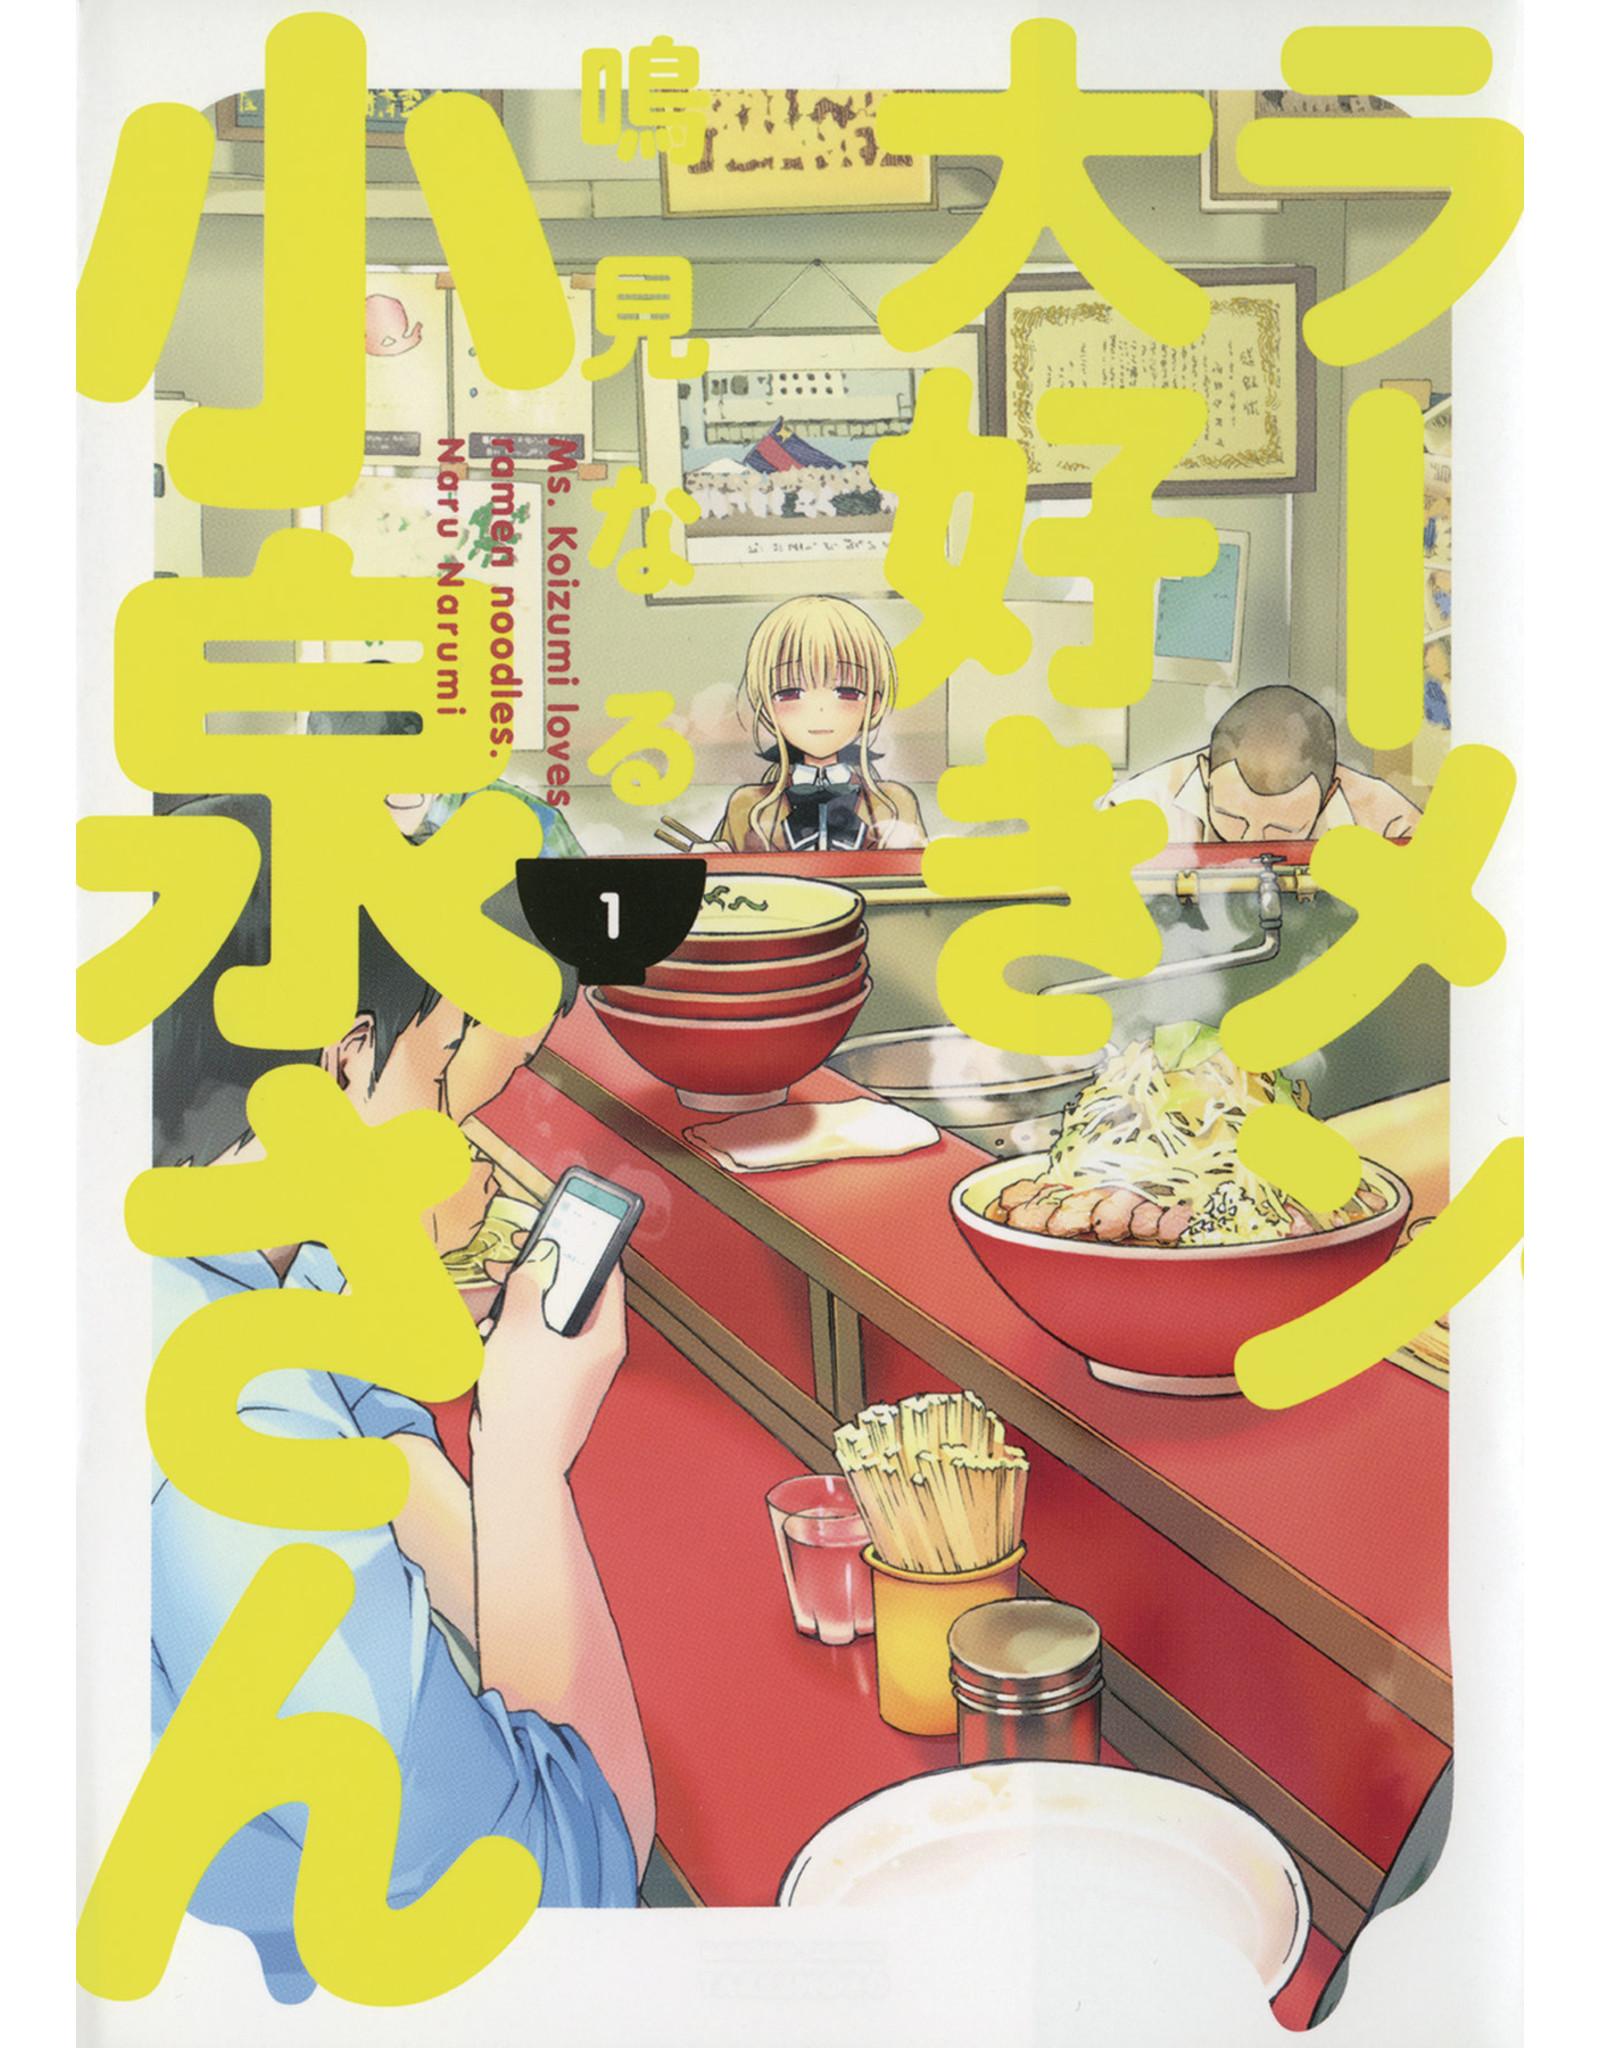 Ms. Koizumi Loves Ramen Noodles 1 (English) - Manga